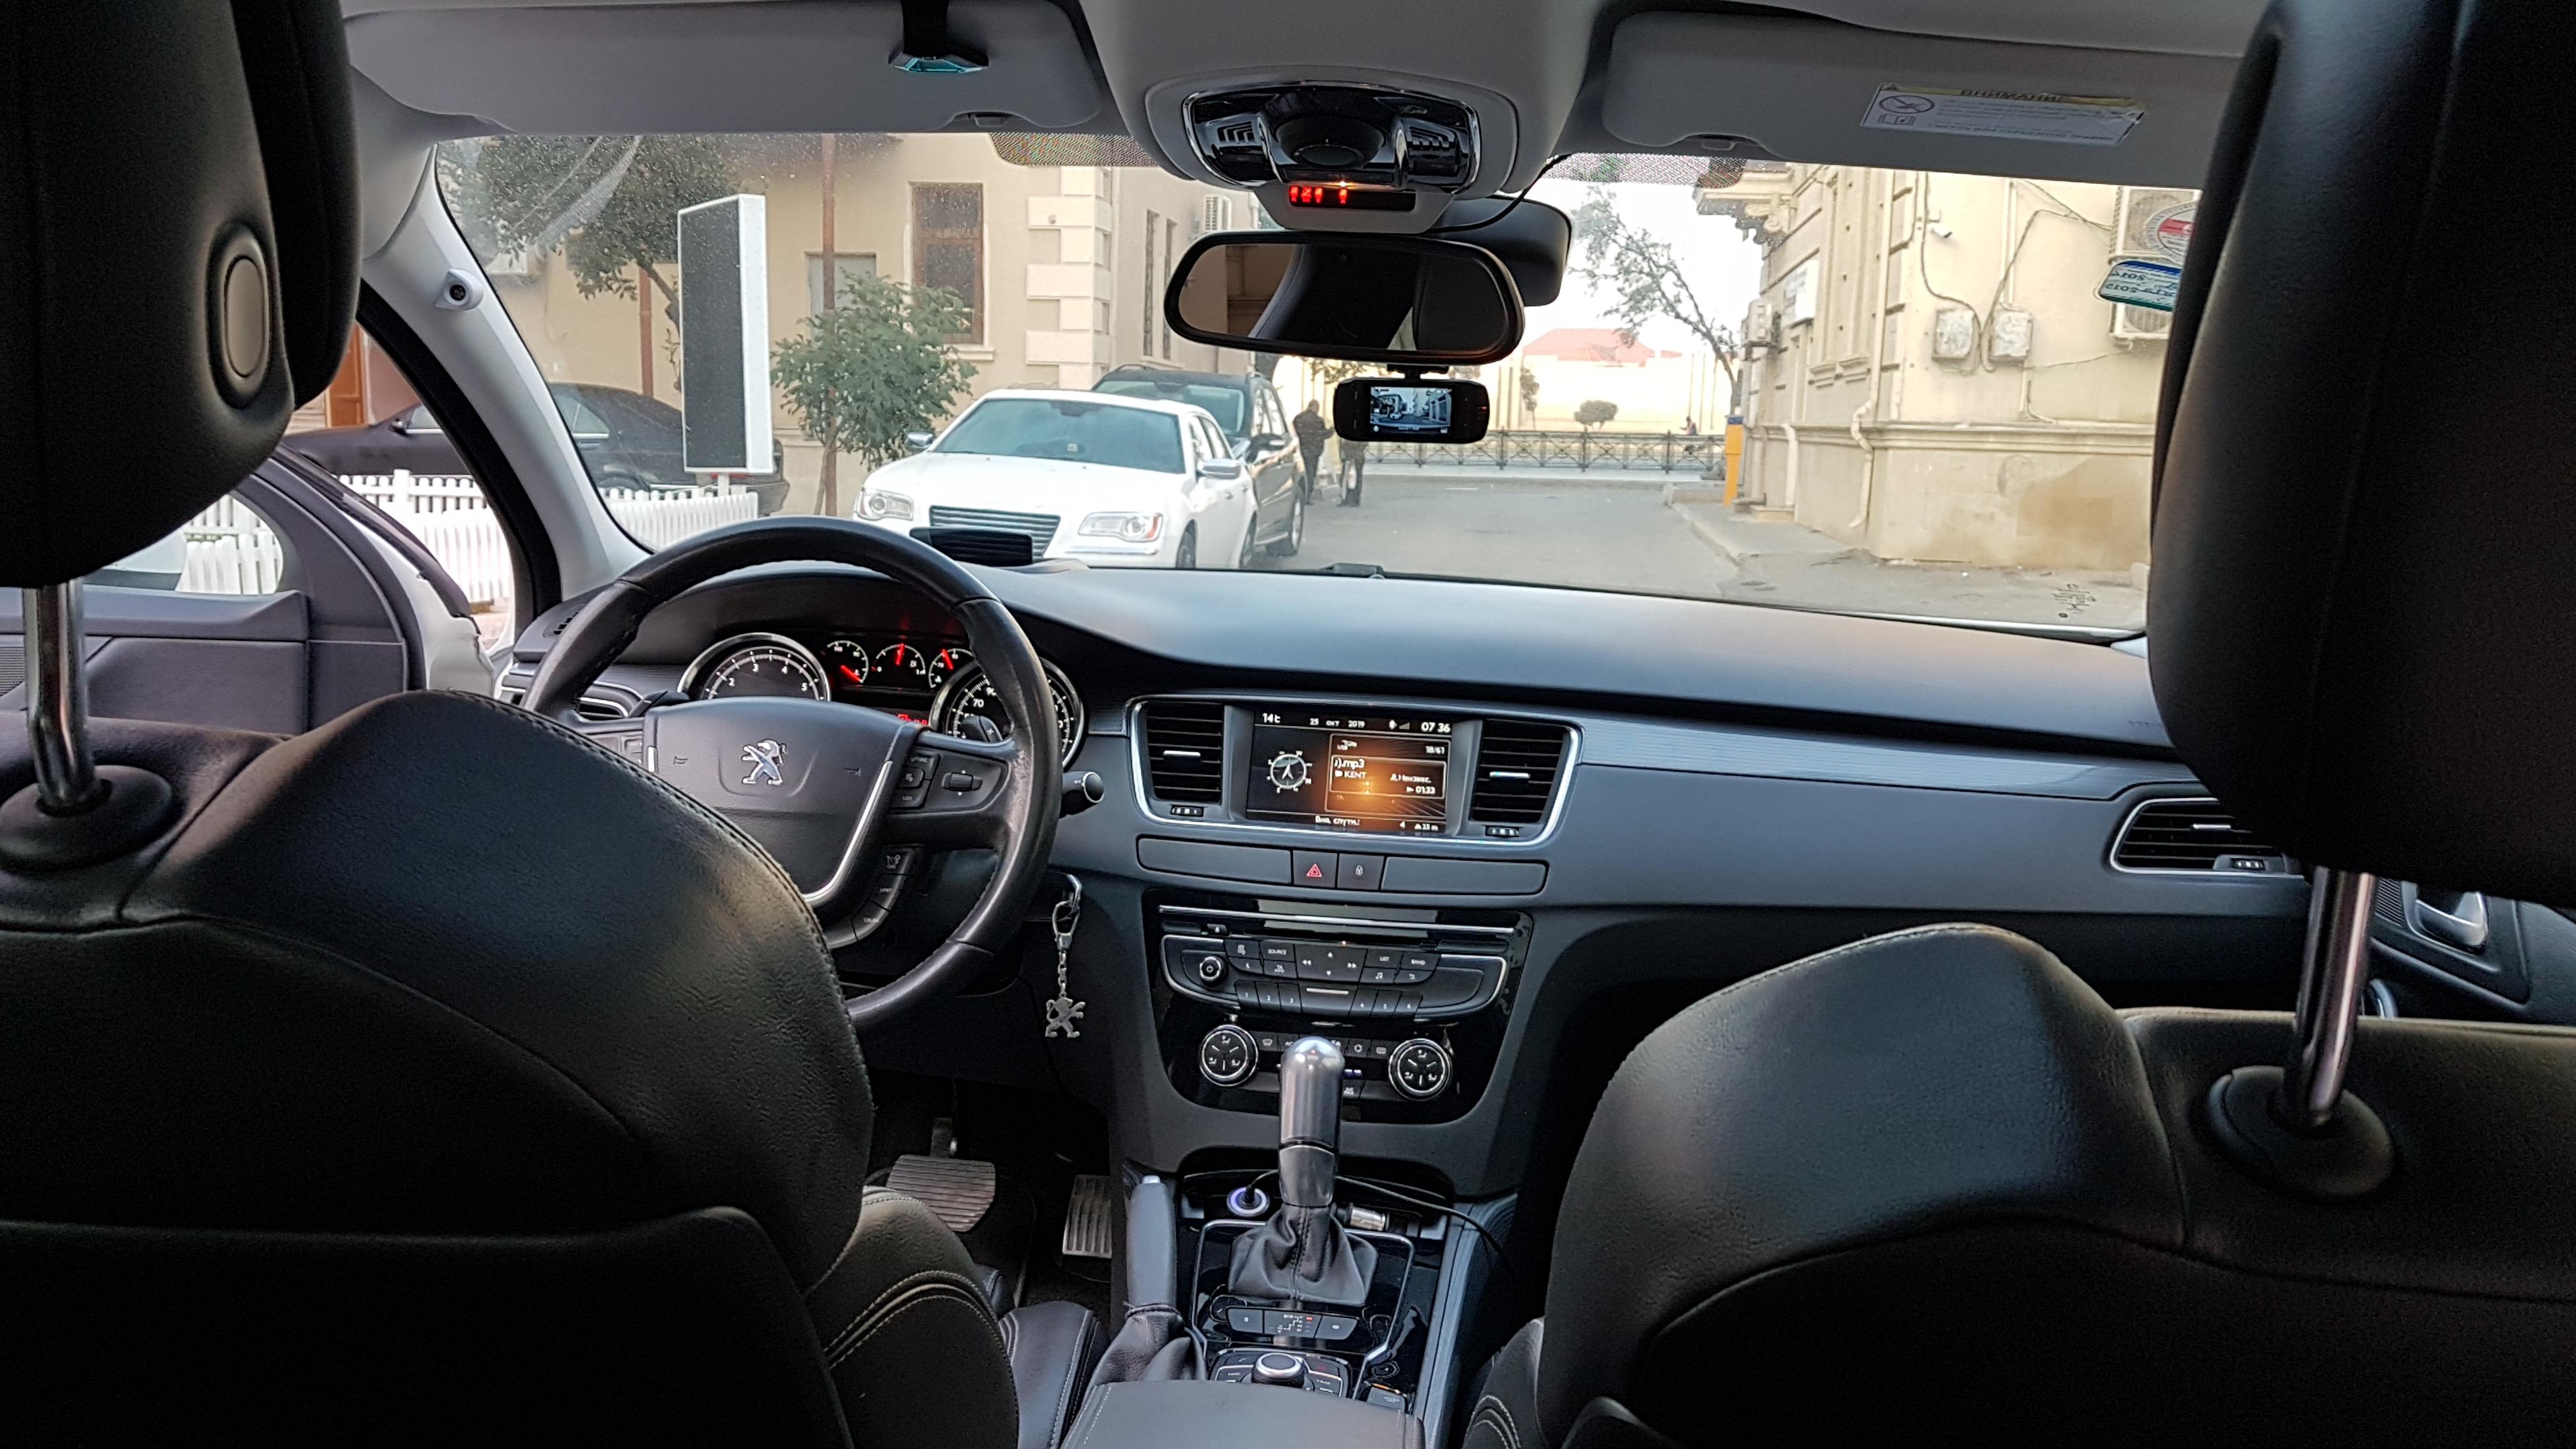 Peugeot 508 1.6(lt) 2014 İkinci əl  $12335